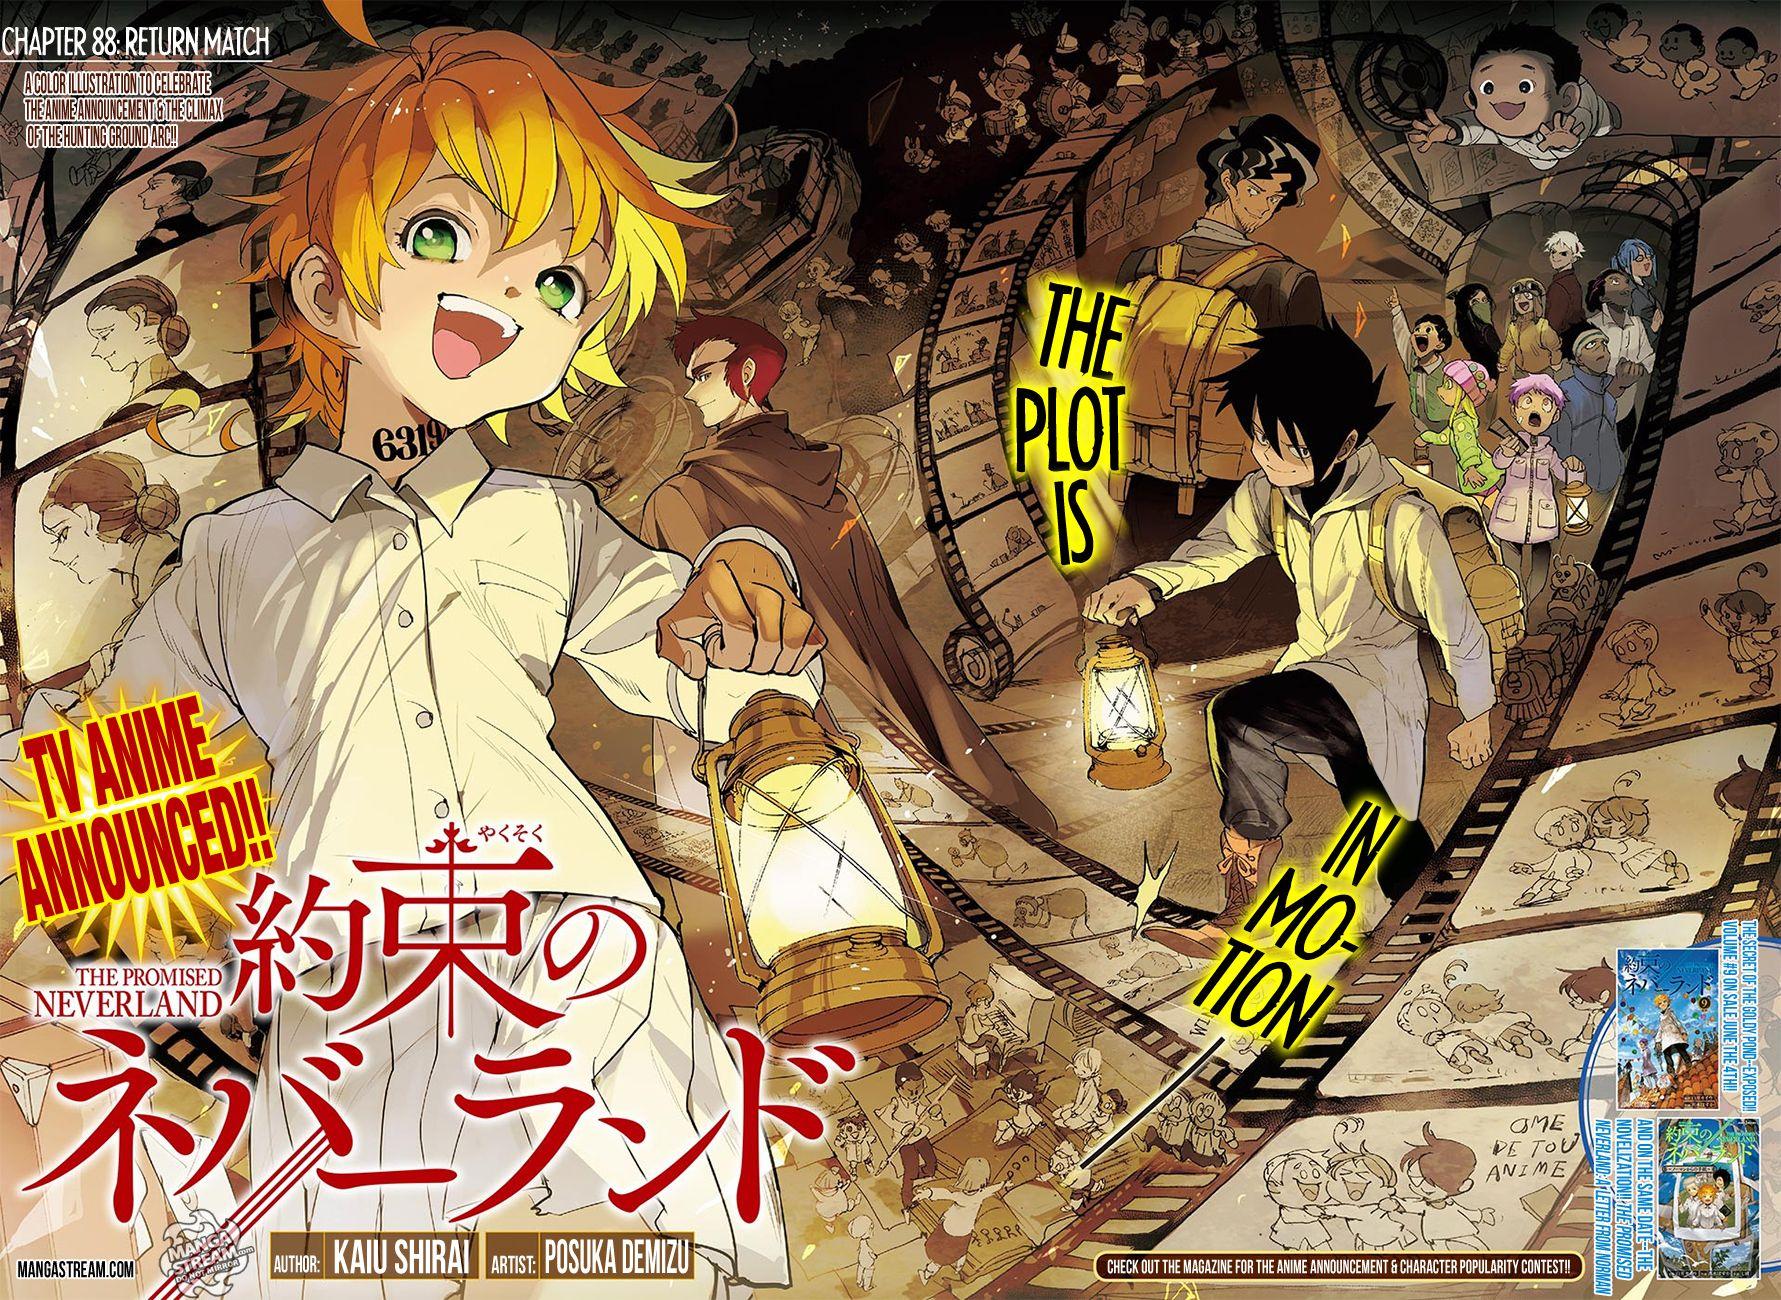 The Promised Neverland 088 Page 4 Manga Stream